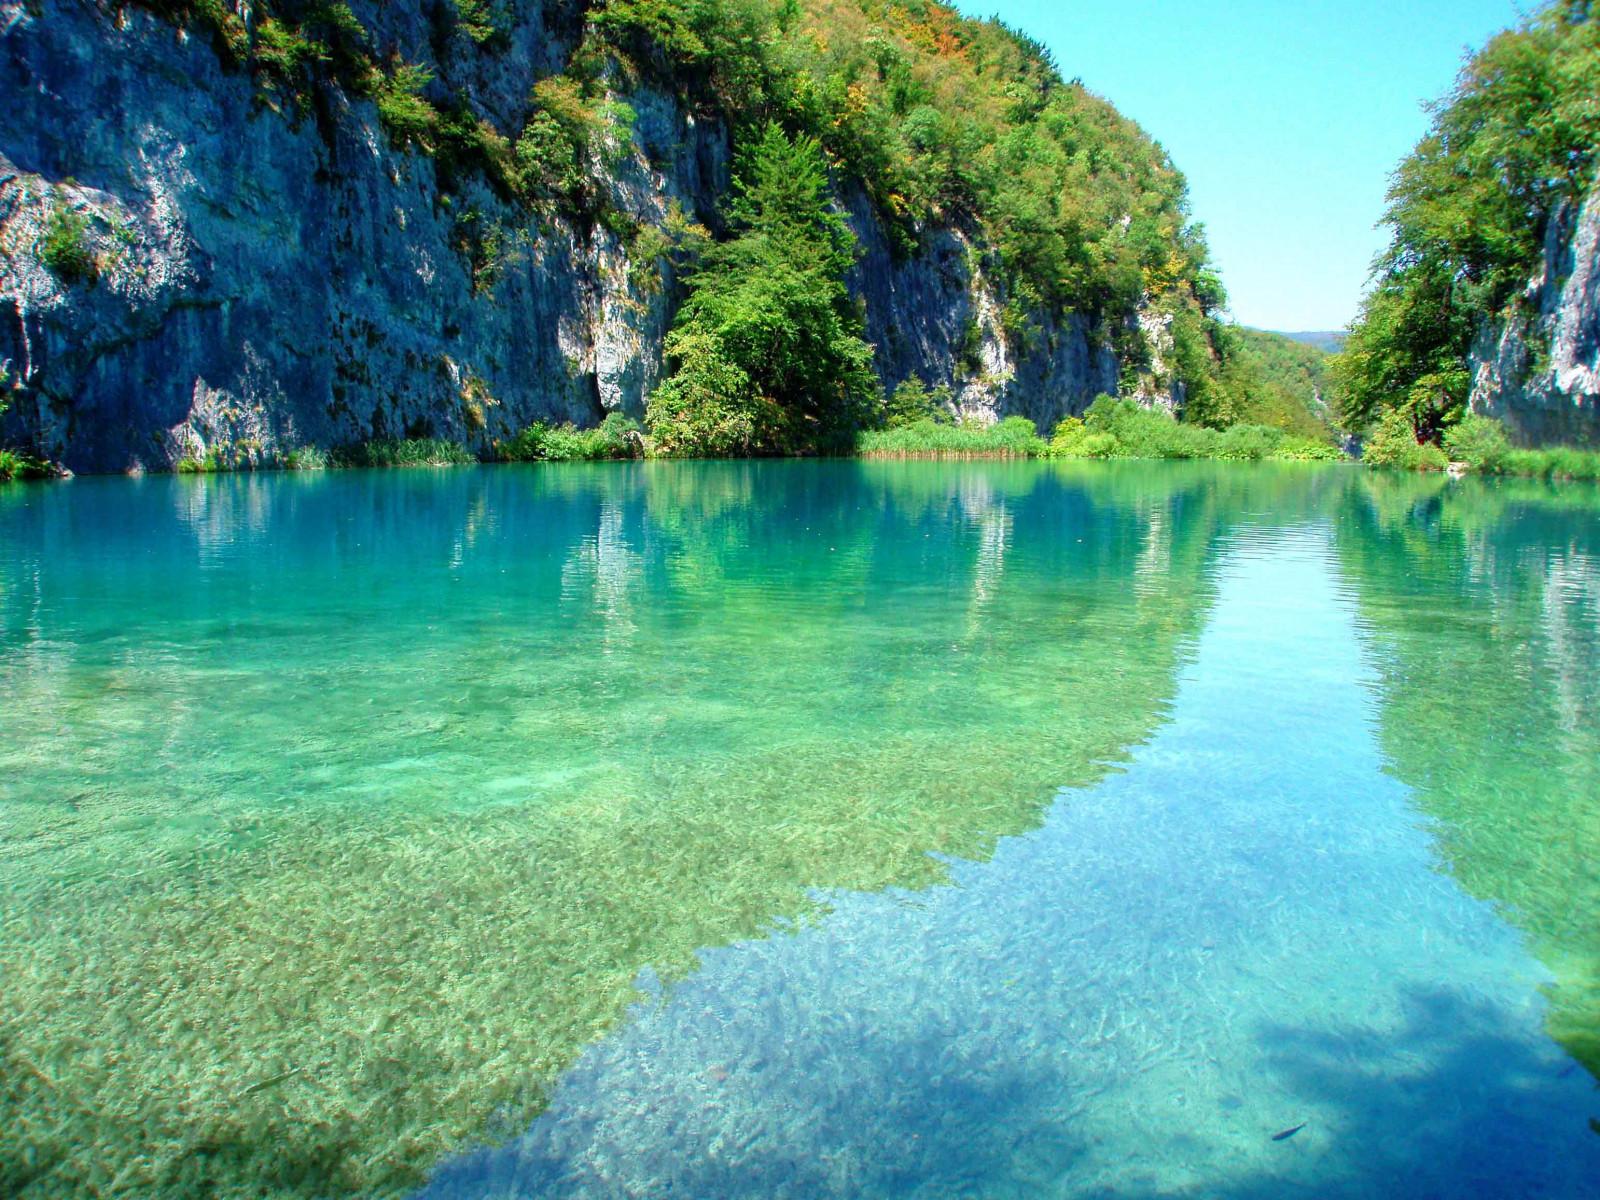 Wallpaper plitvice lakes croatia lake park mountain 3085x2314 wallup 1005606 hd - Plitvice lakes hd ...